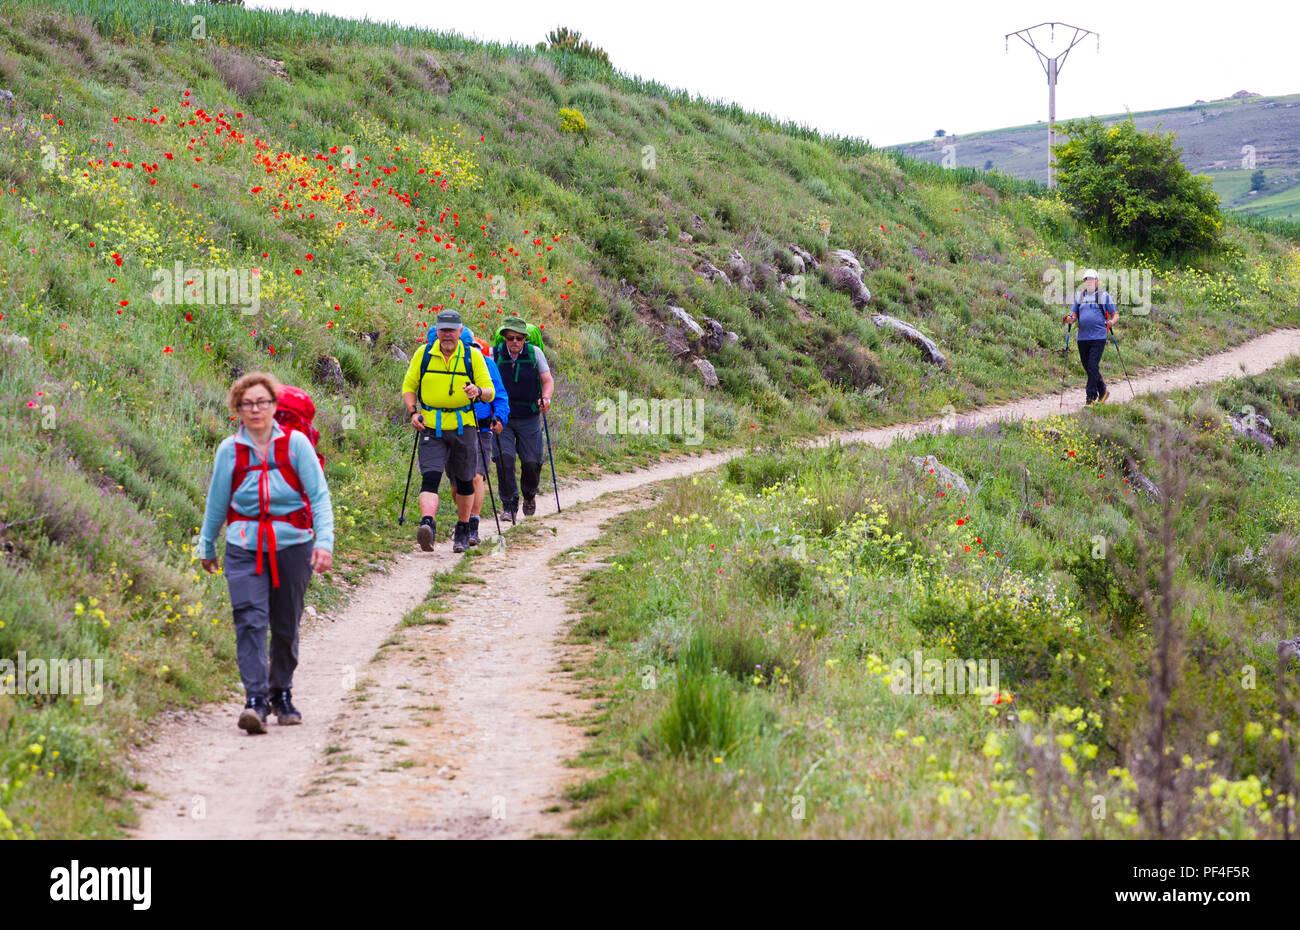 Pilgrims men and women walking on the way of St James the Camino de Santiago between Hontanas and Castrojeriz Burgos Castille y Leon Spain - Stock Image